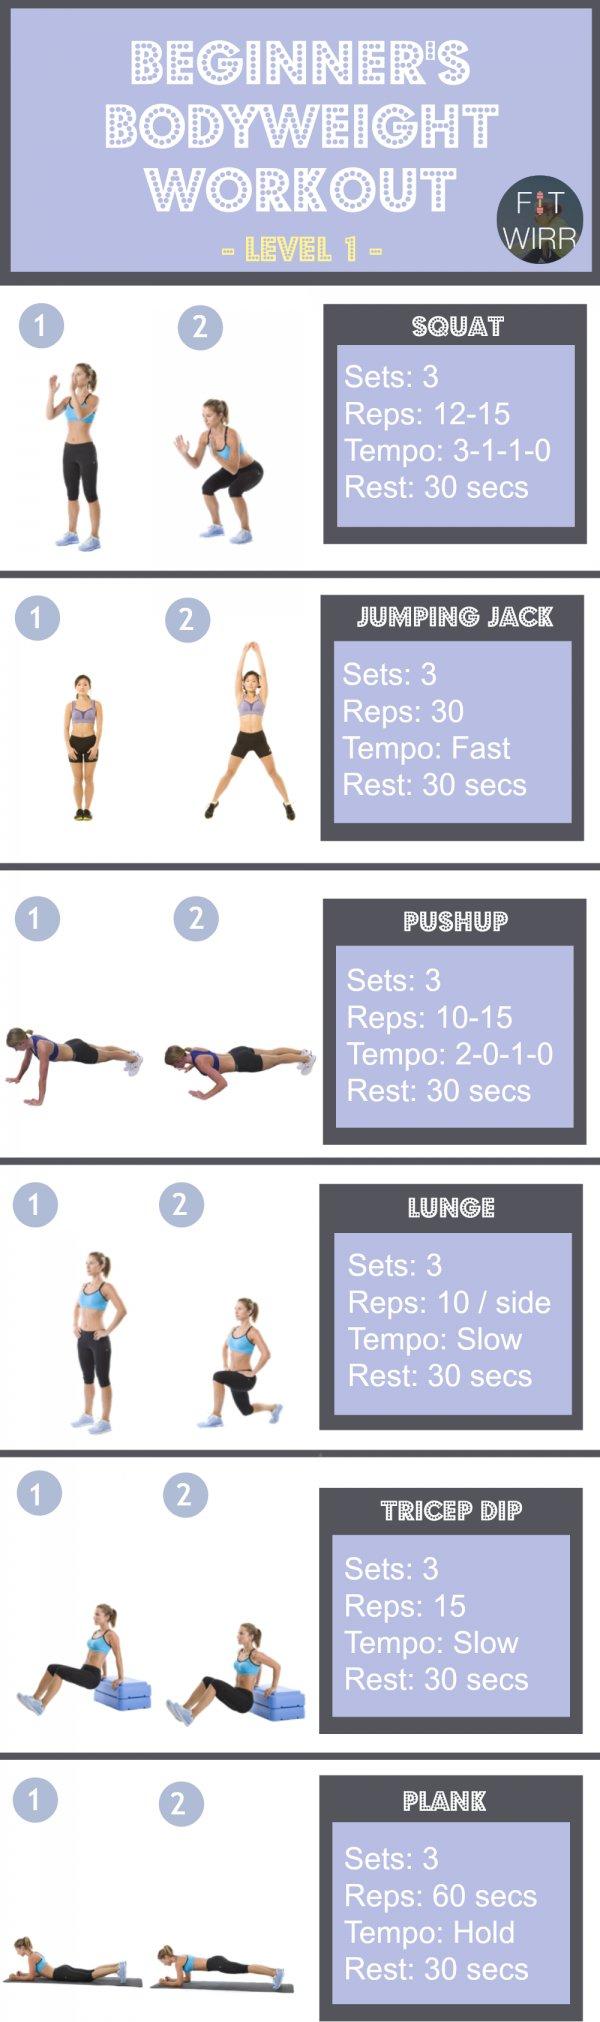 Beginner's Bodyweight Workout, Level 1